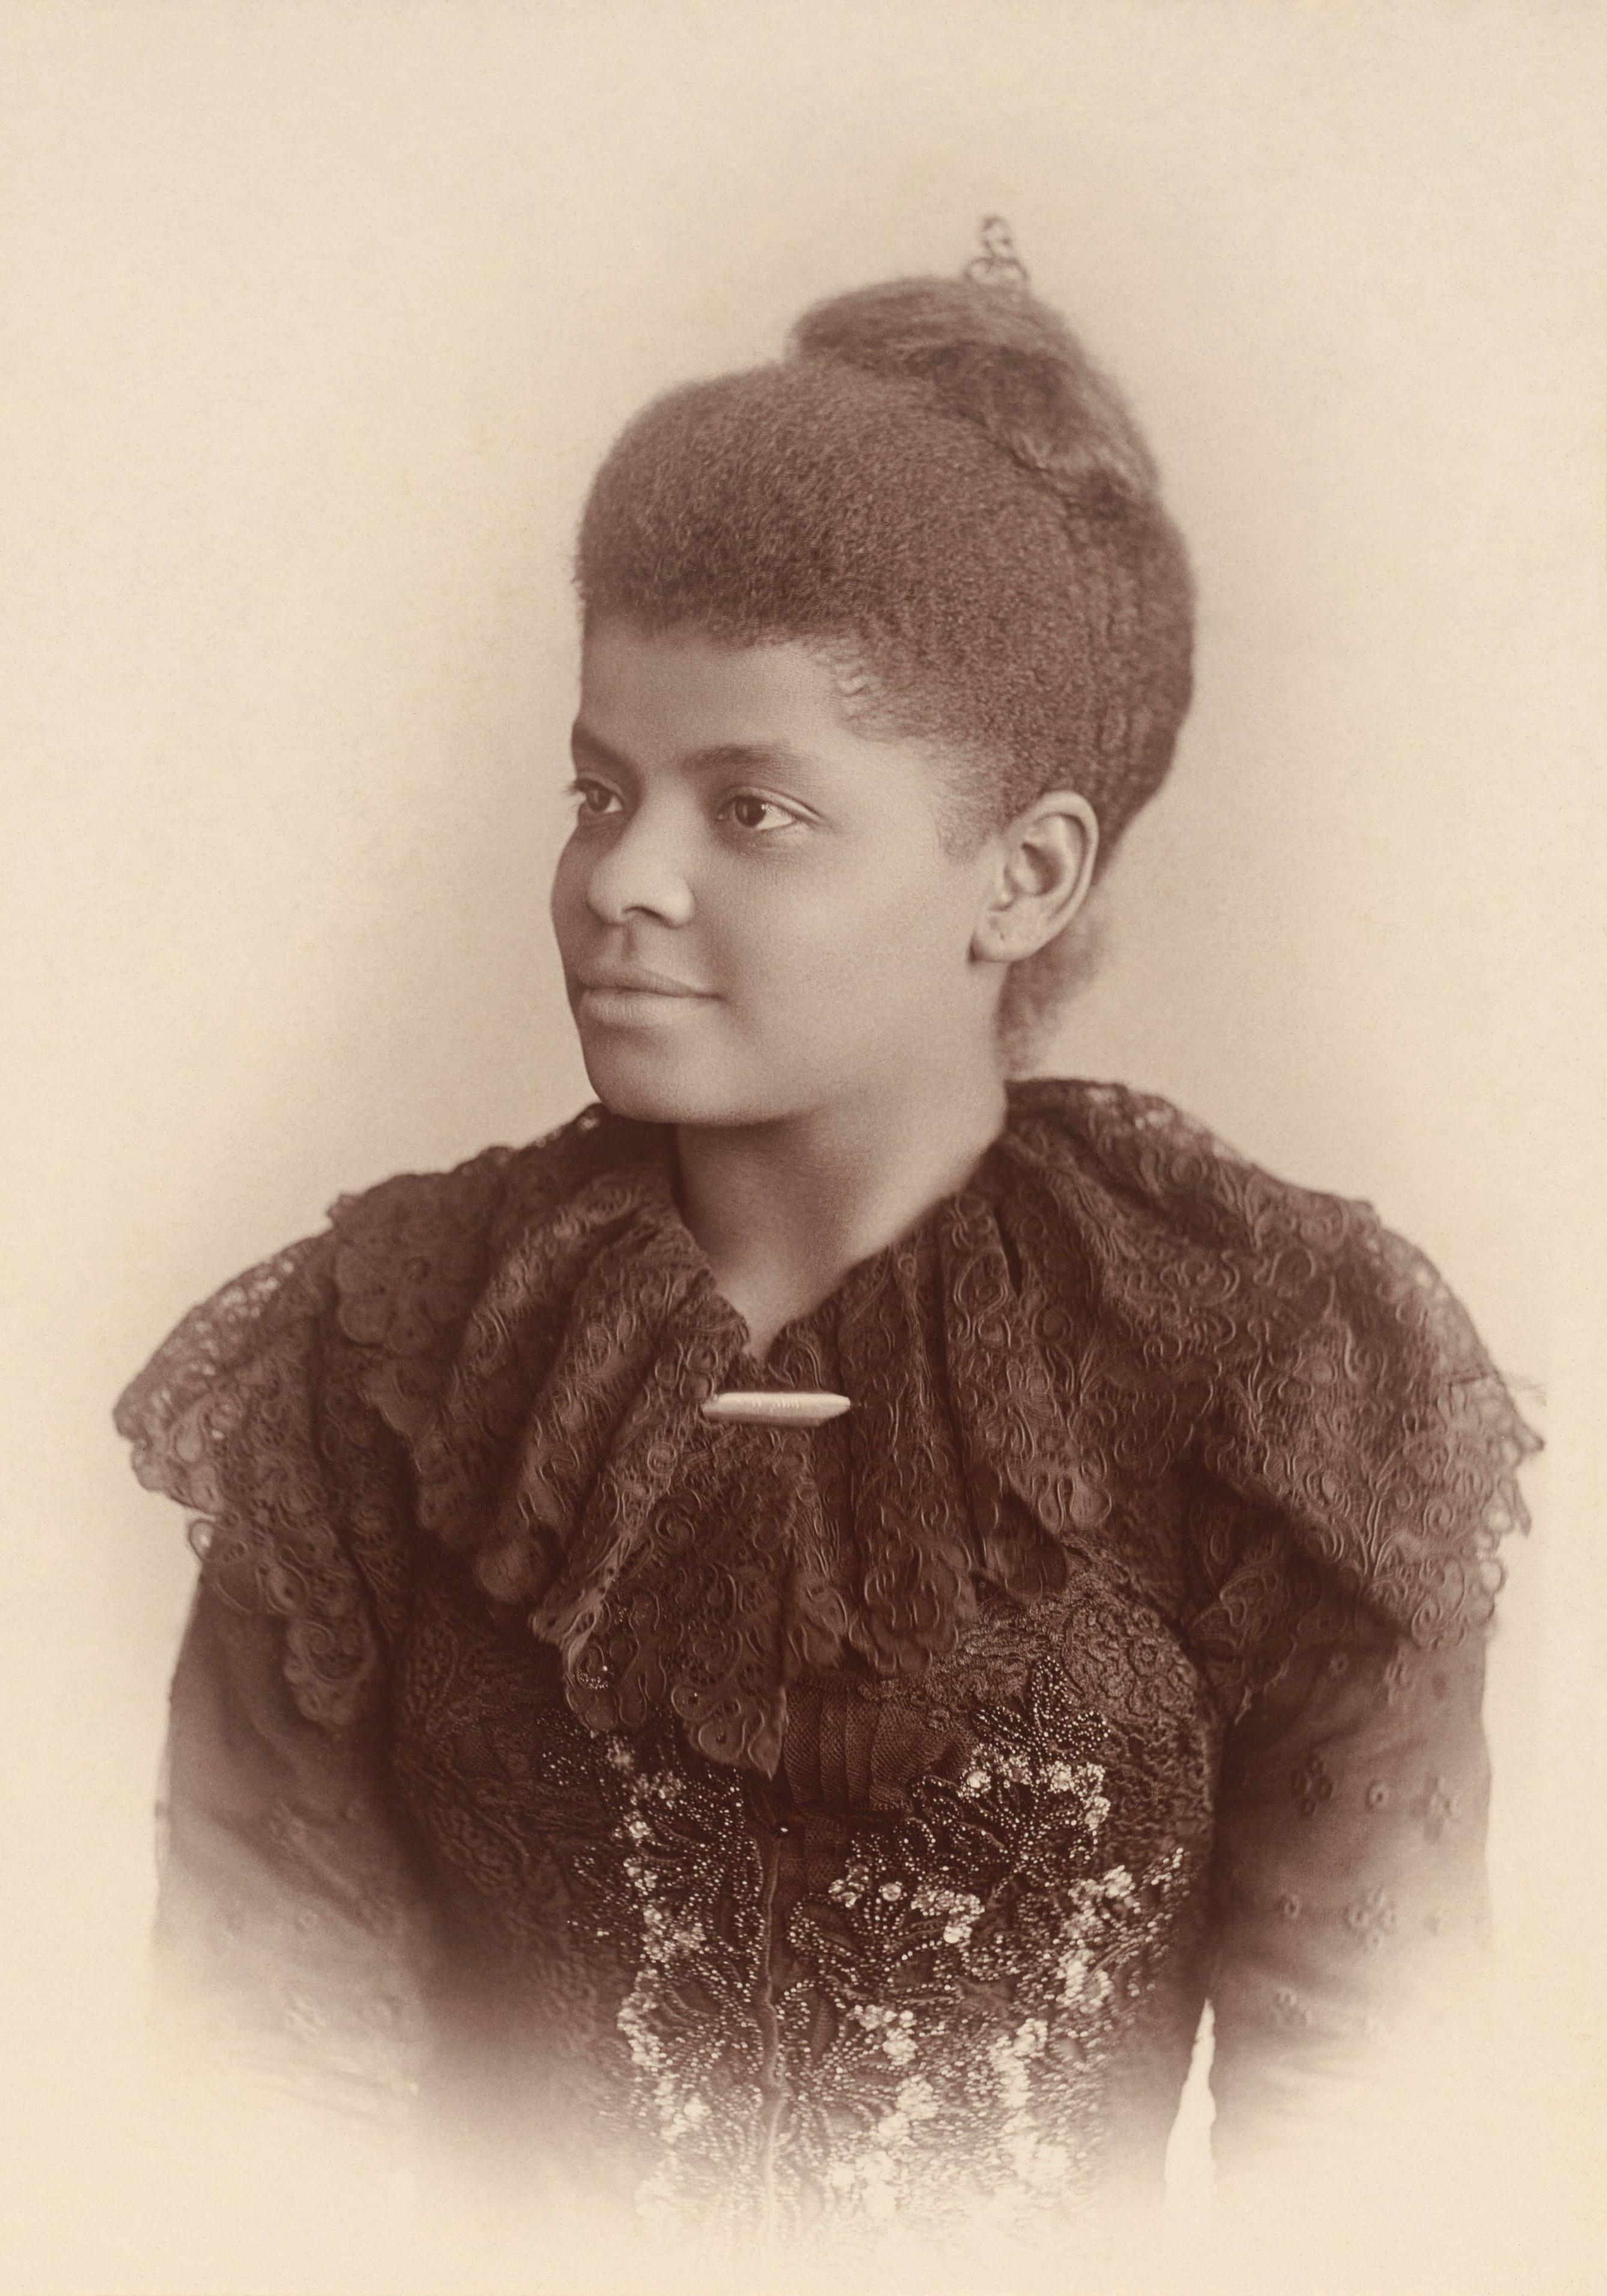 Photographic portrait of Ida B. Wells-Barnett.